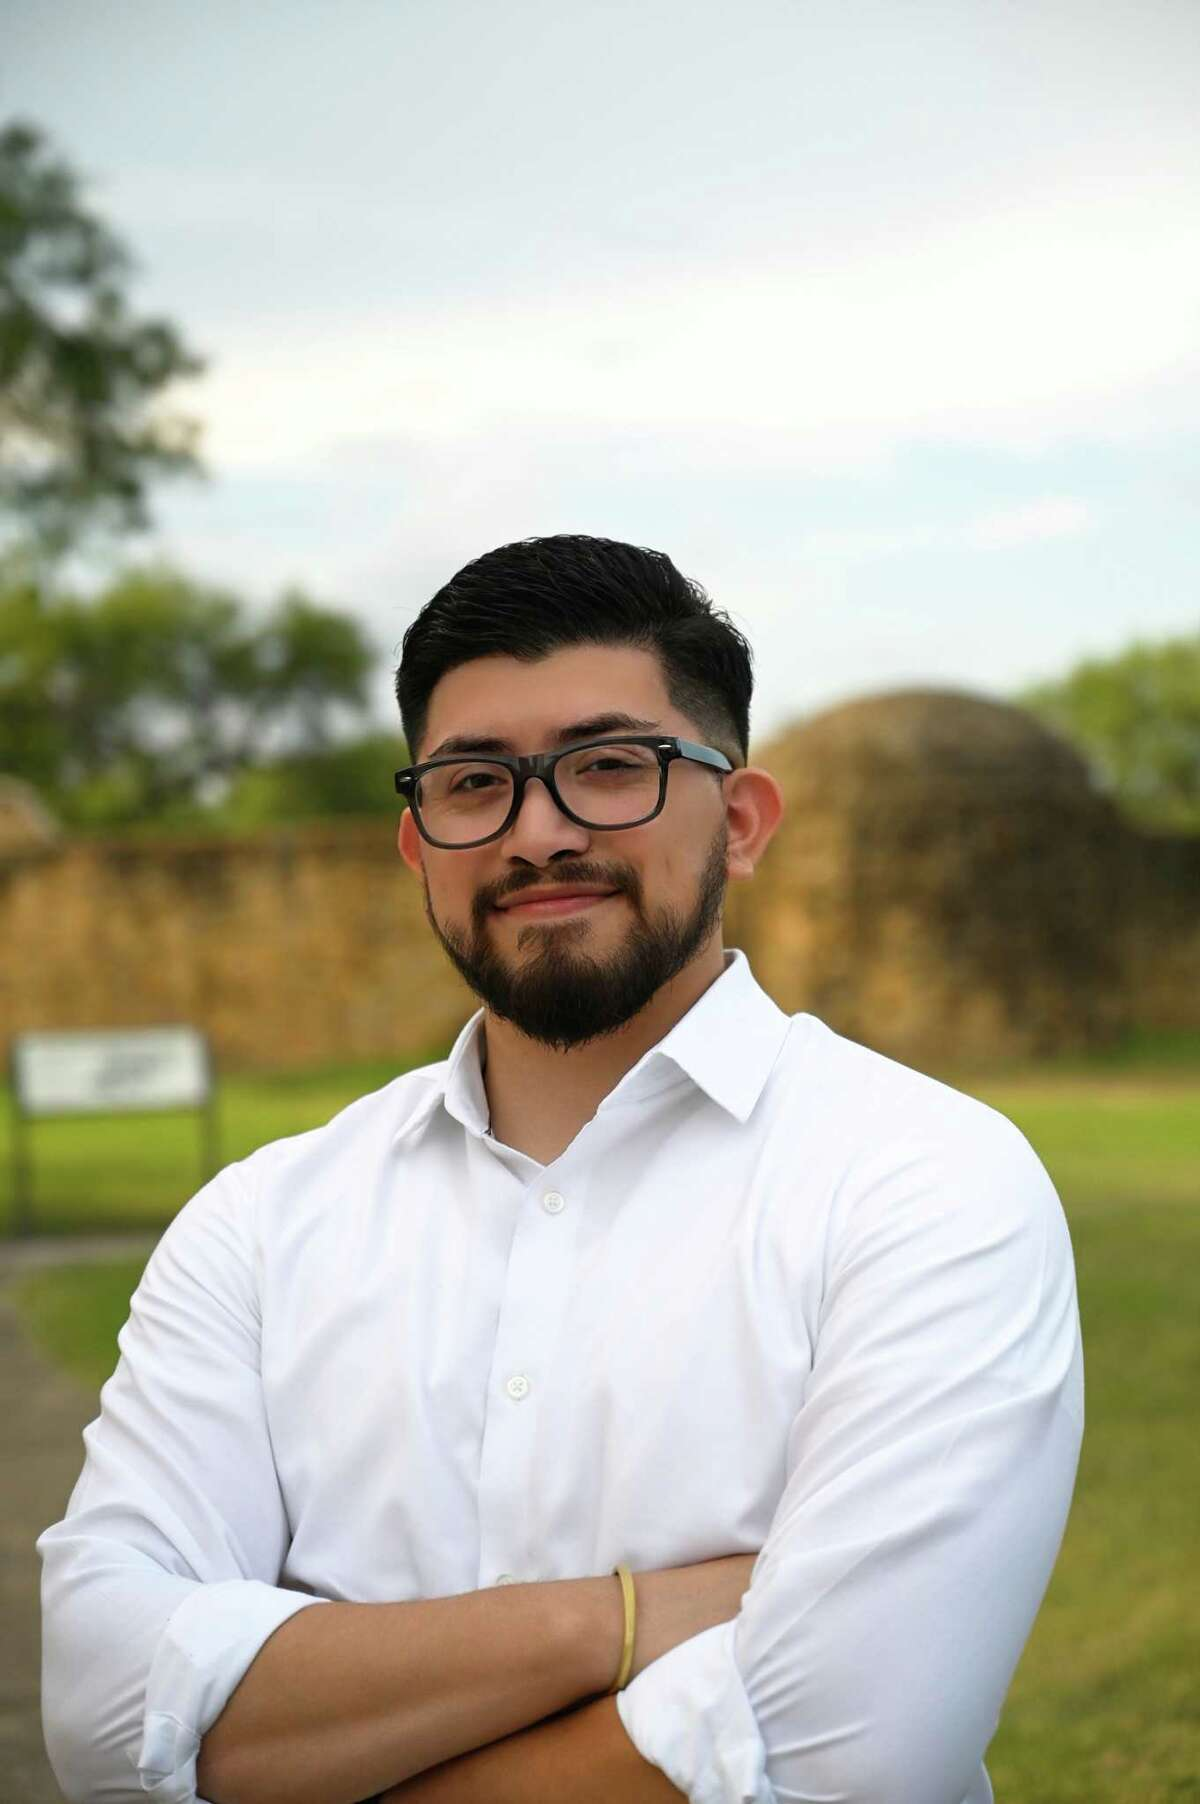 Frank Ramirez is the Democrat in a Nov. 2 runoff to serve Texas District 118.